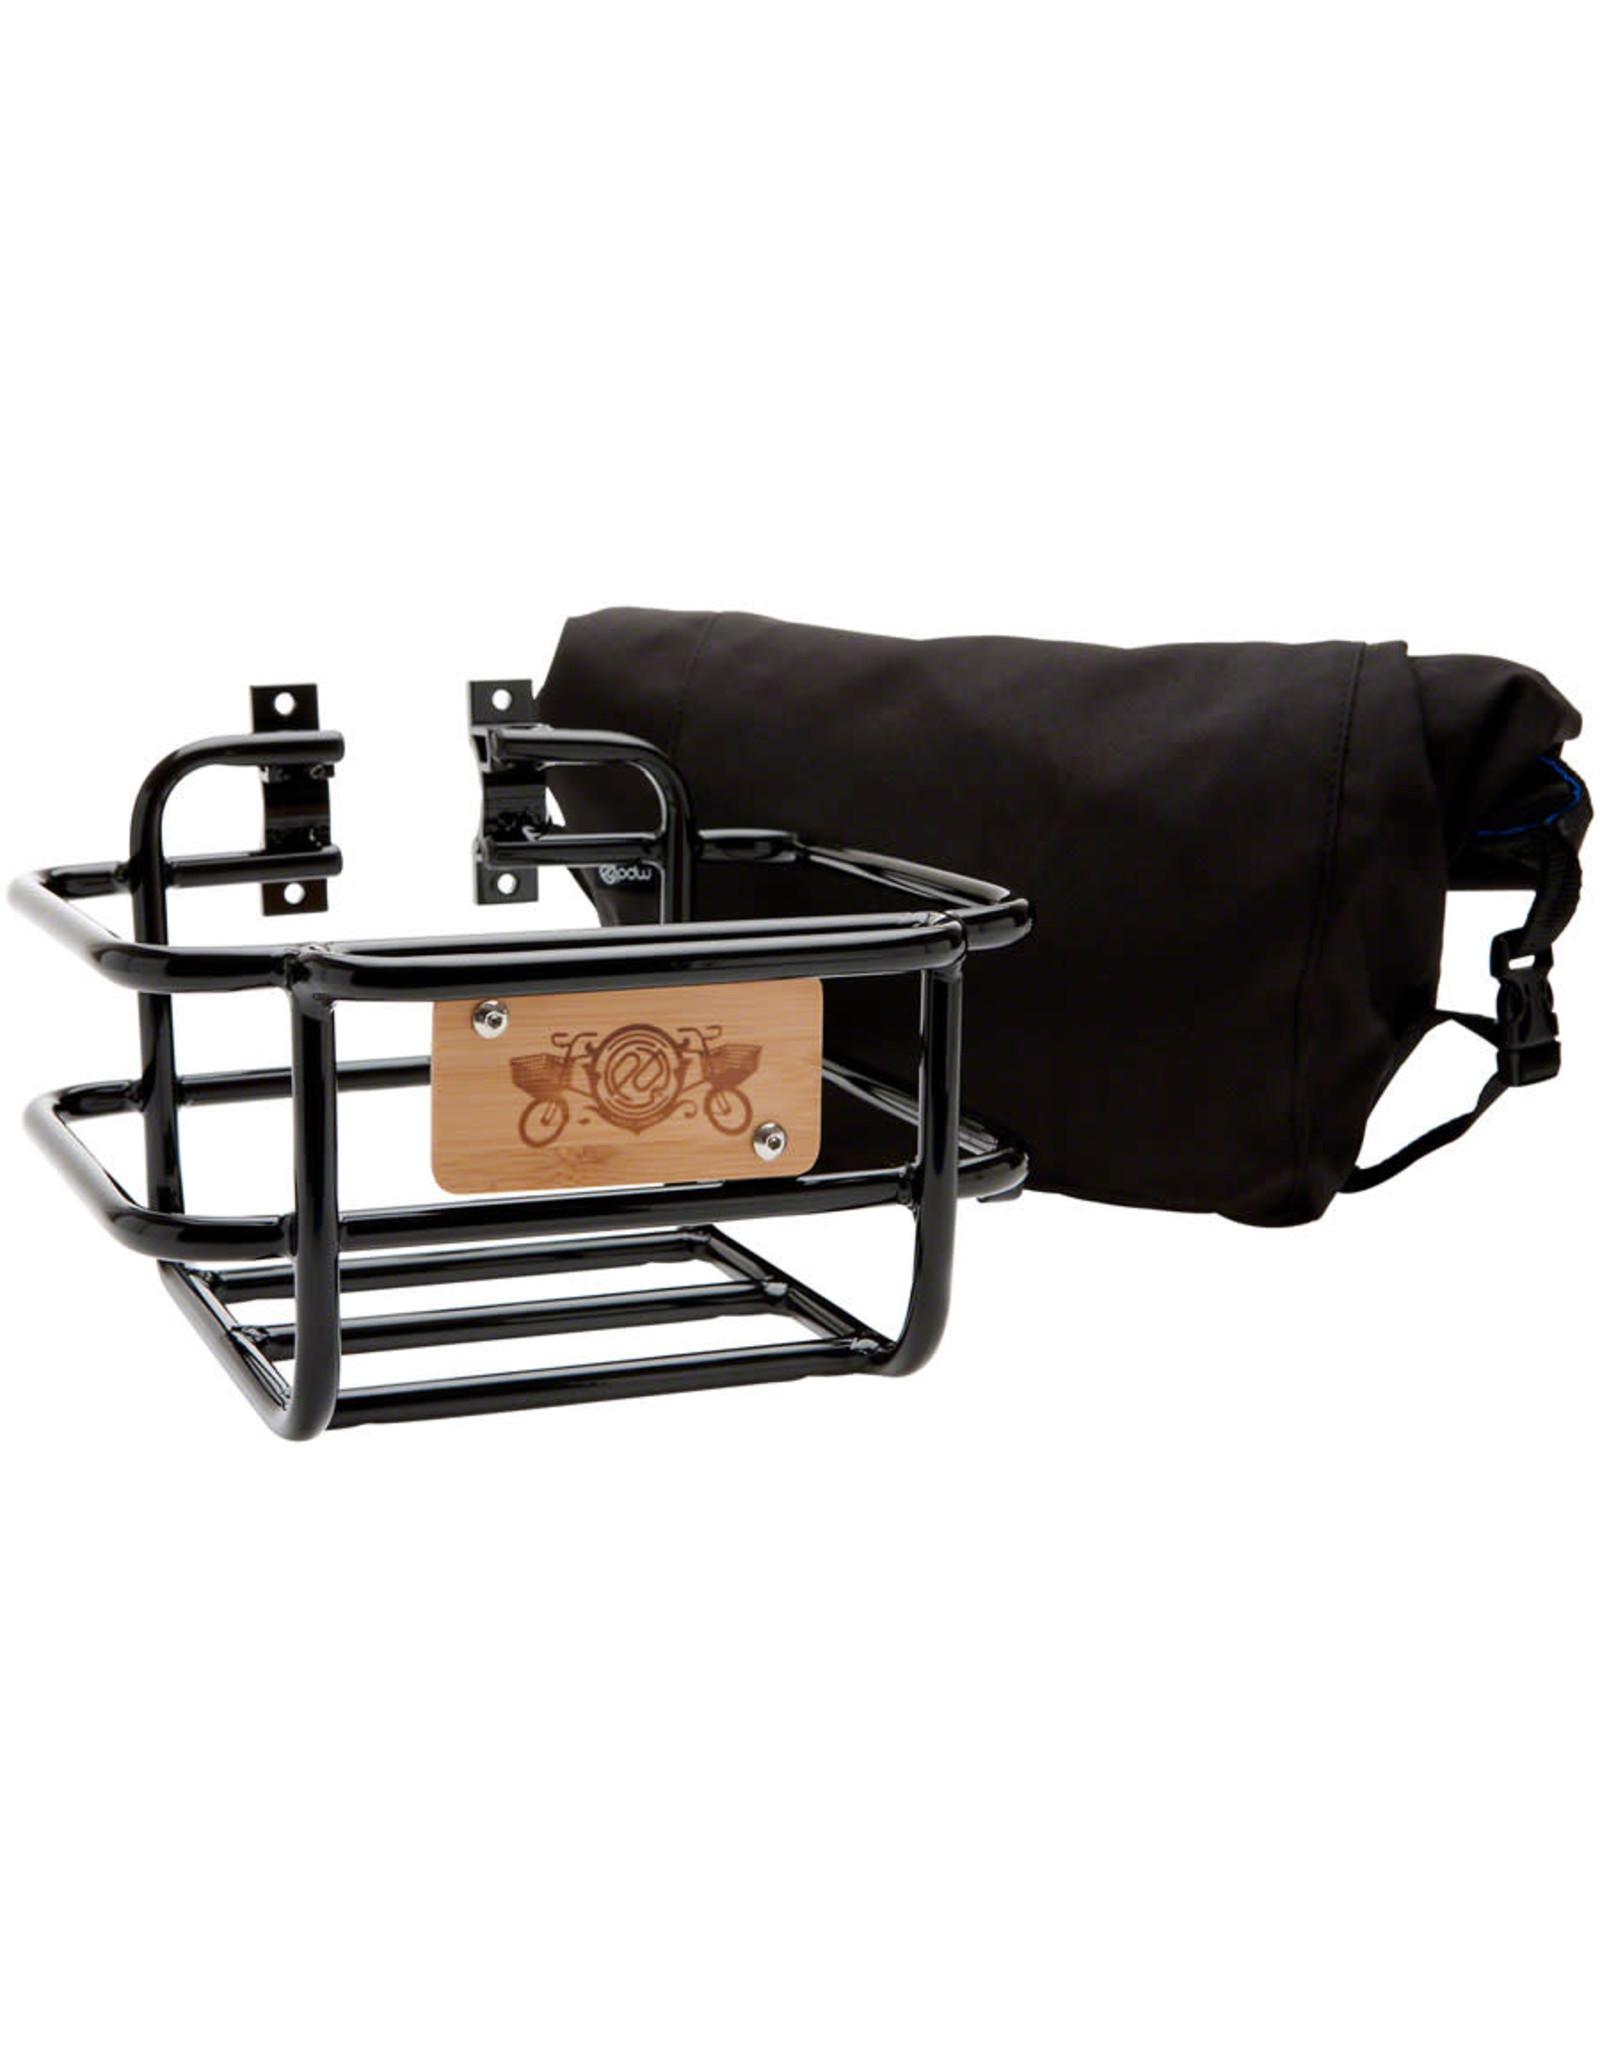 PDW Portland Design Works Takout Basket with Roll-Top Bag